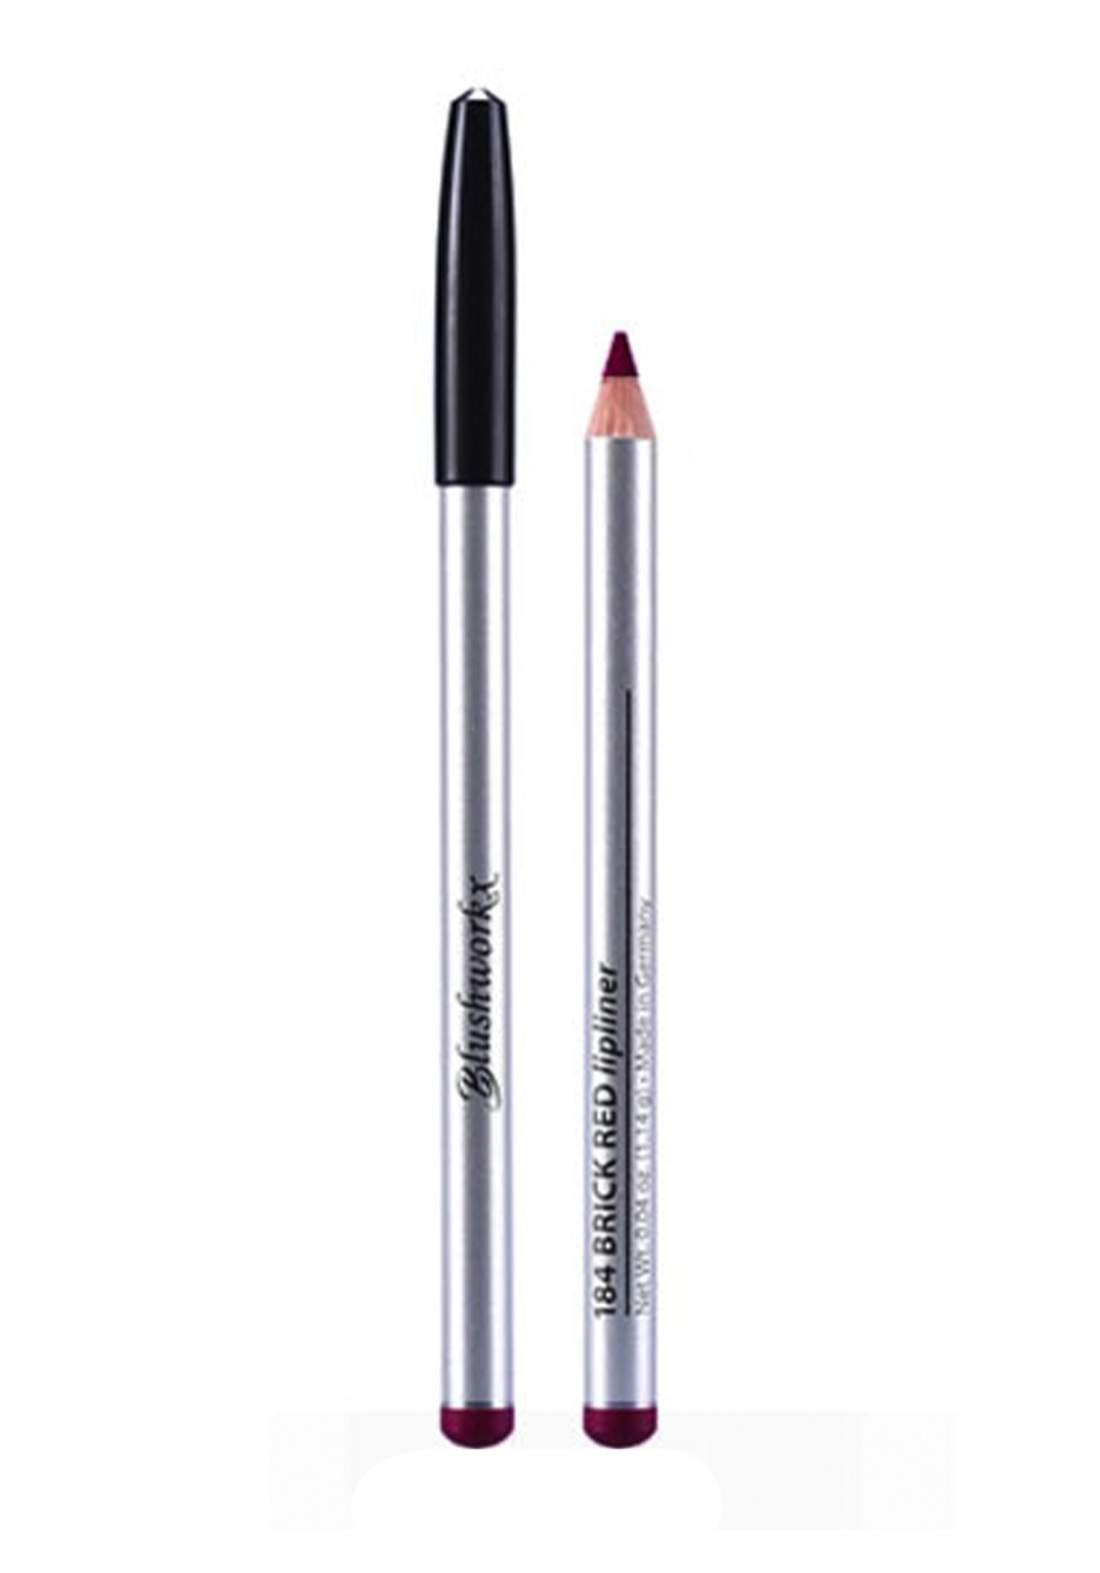 Blushworkx Hollywood Lip Liner Pencil No.187 Boysenberry 1.14g محدد الشفاه